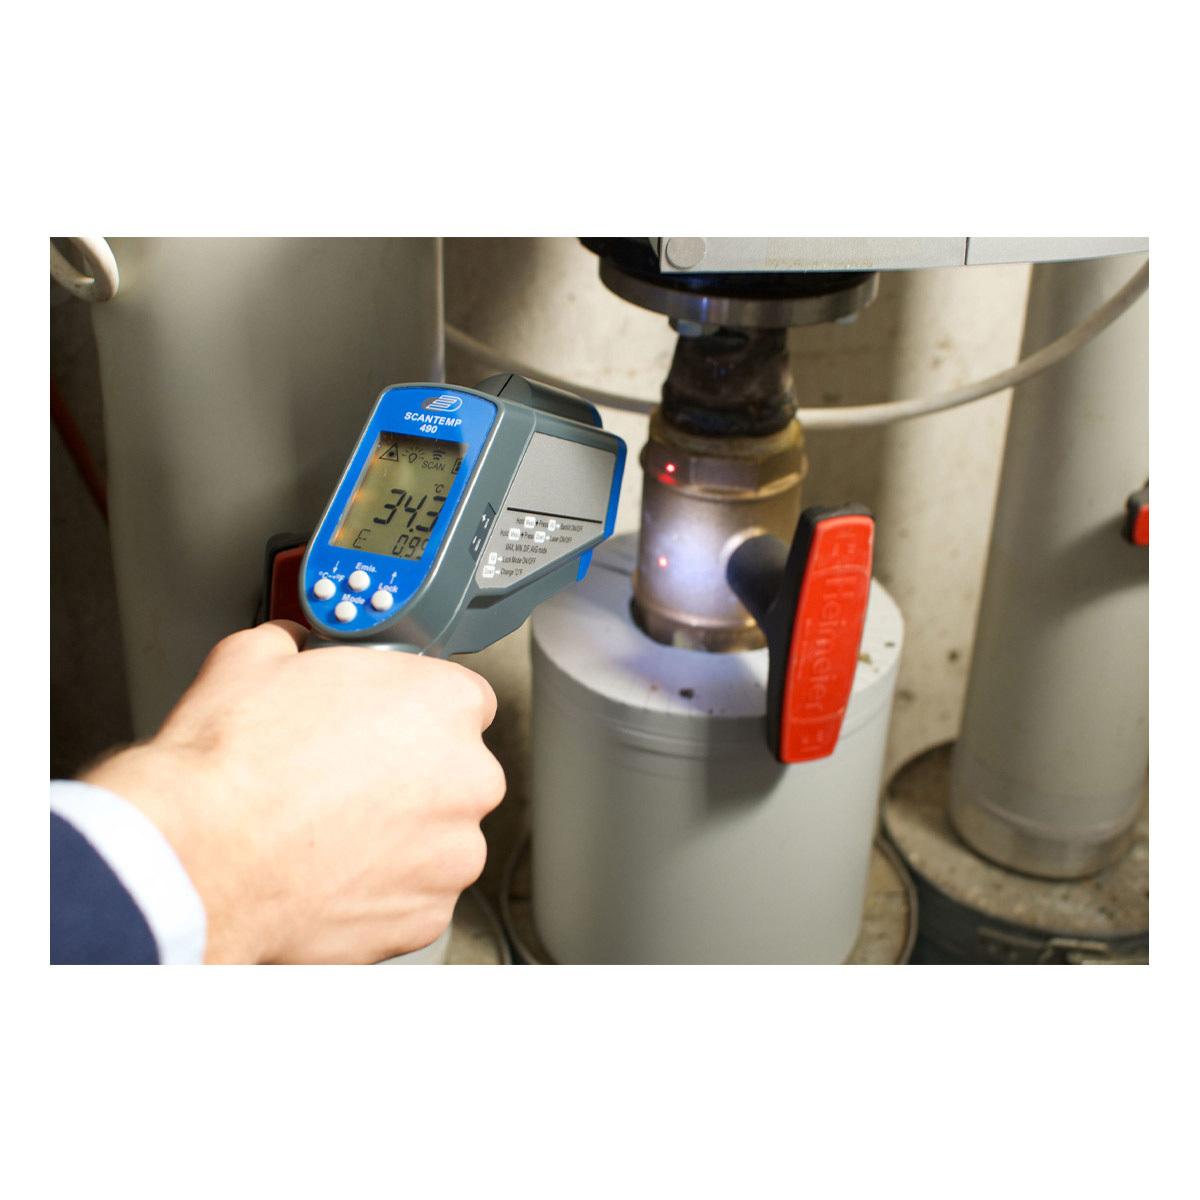 31-1123-k-infrarot-thermometer-scantemp-490-anwendung2-1200x1200px.jpg